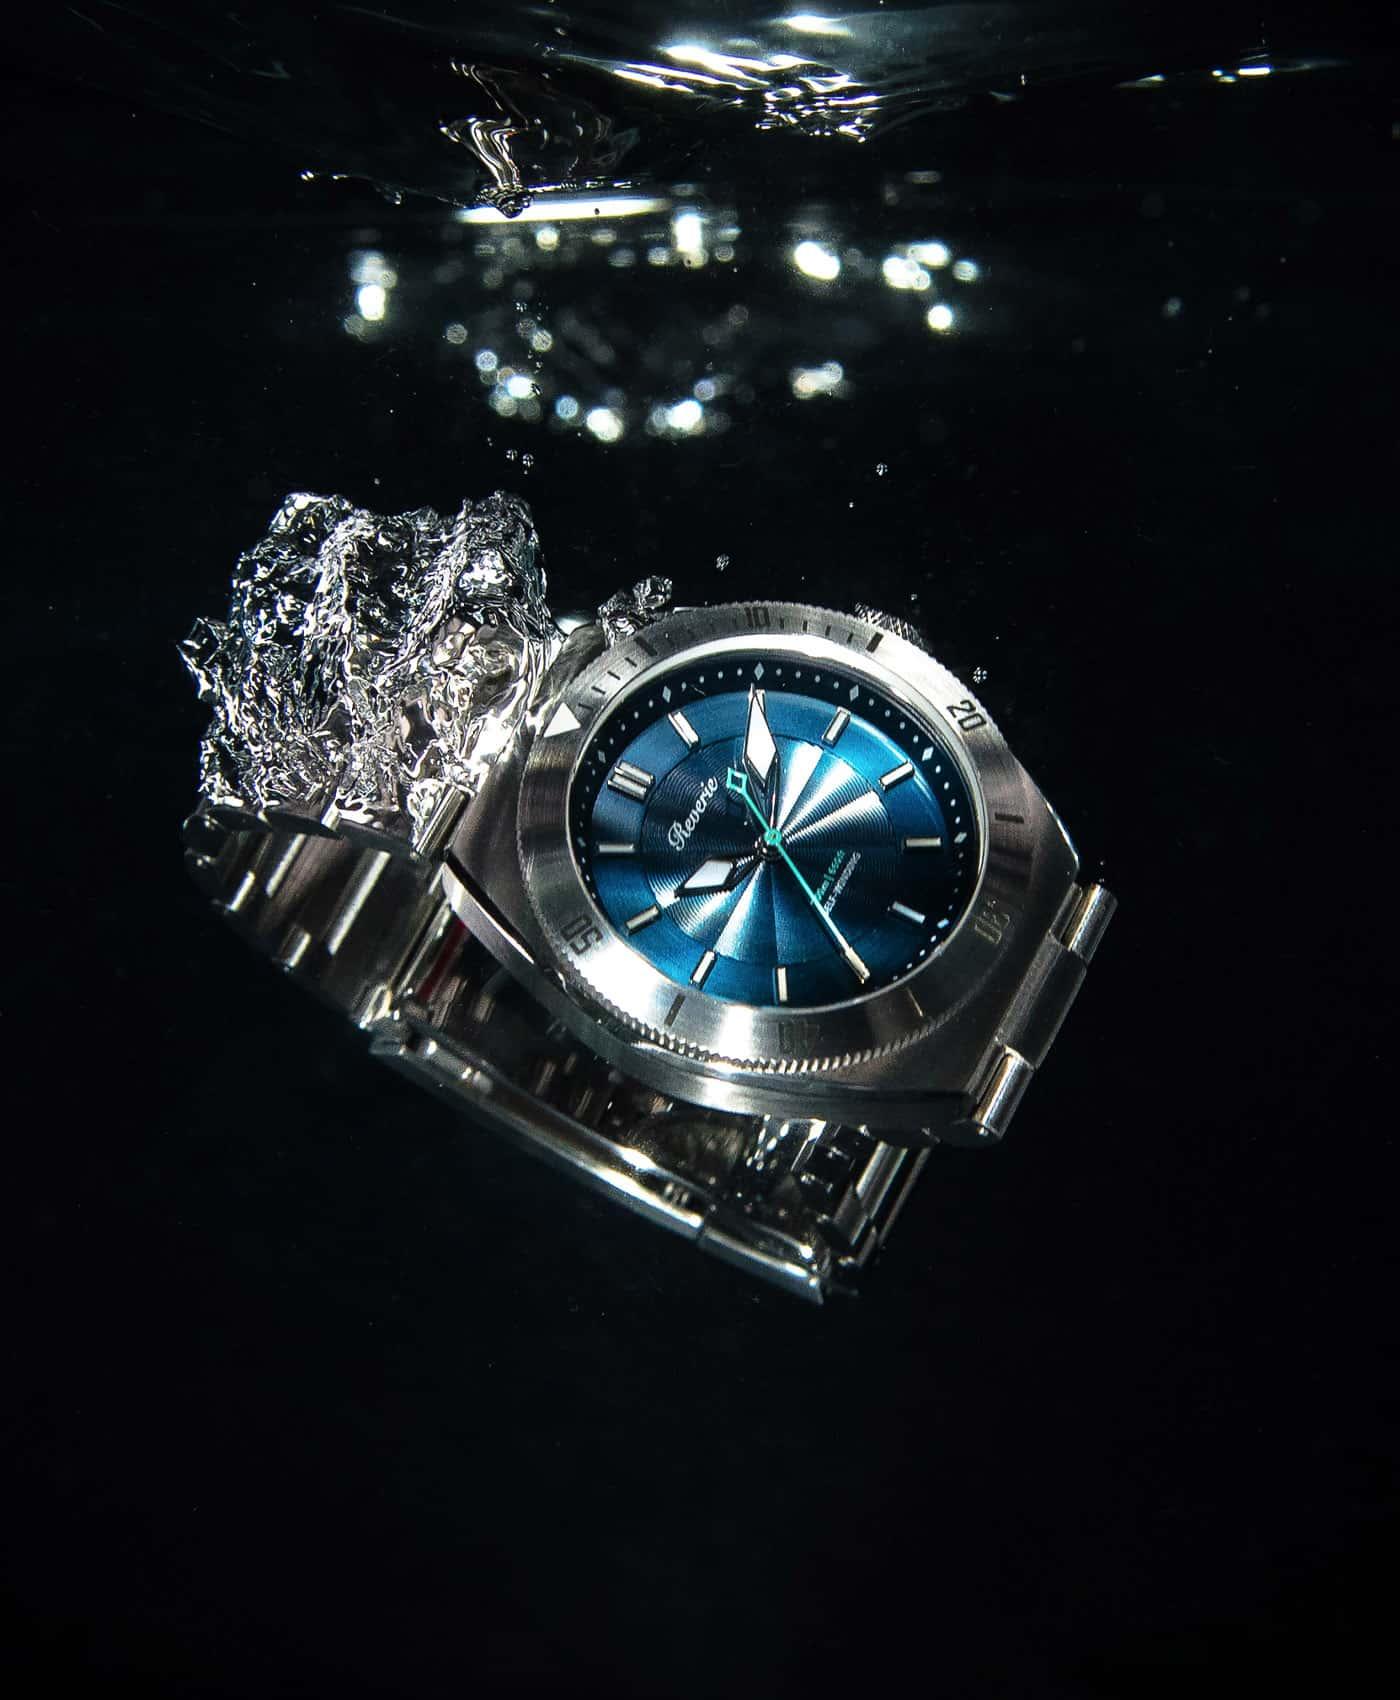 Reviere Diver Blue-water drop